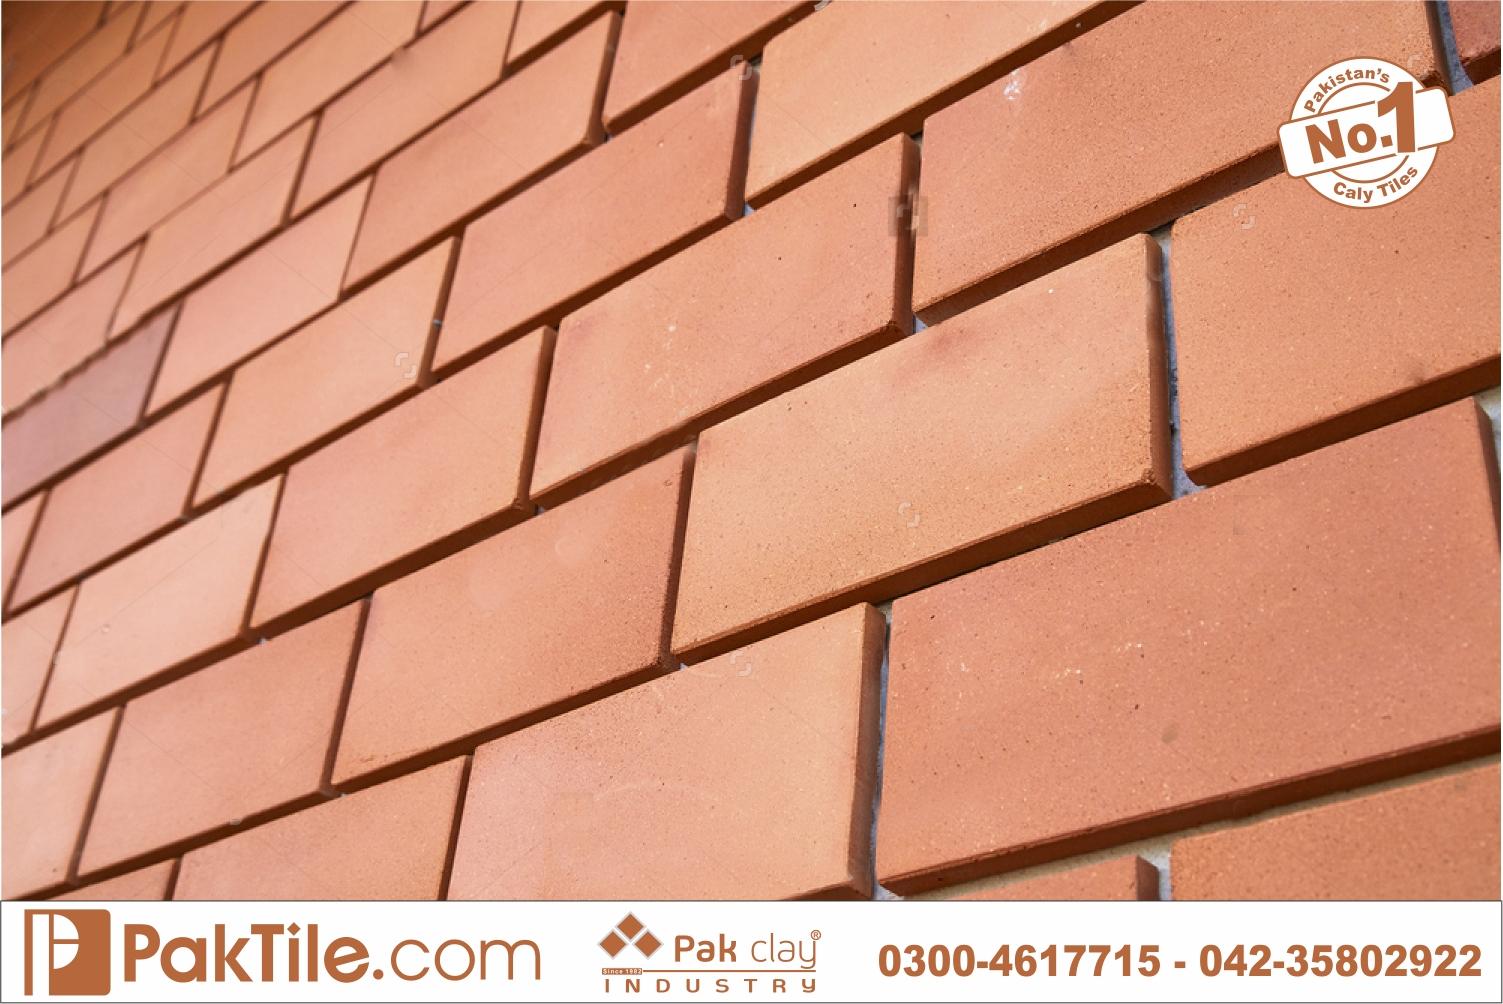 14 Pak Clay brick tiles kitchen brick tiles lahore brick tiles for interior walls images